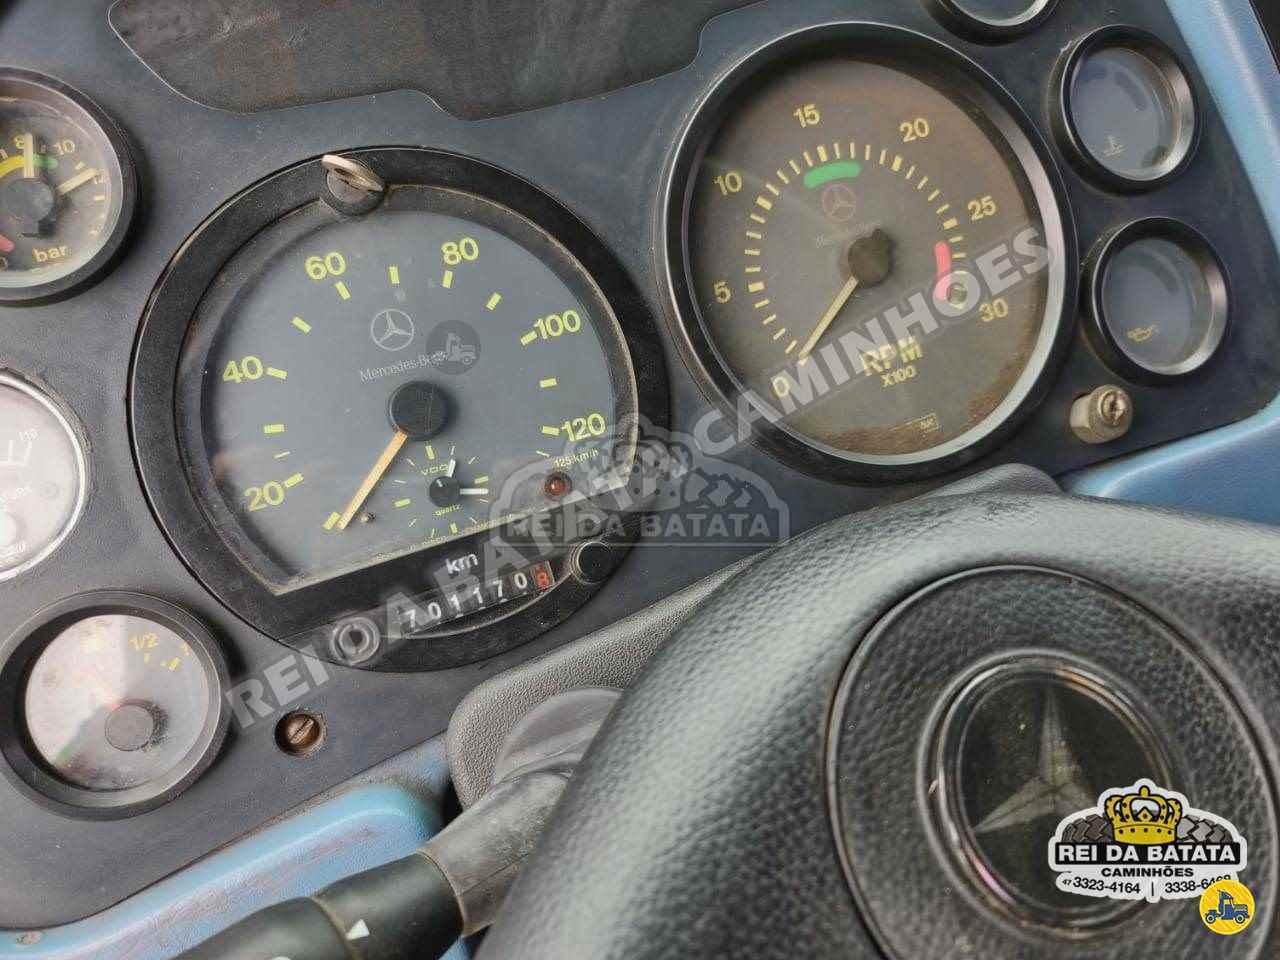 MERCEDES-BENZ MB 1620 701000km 1998/1998 Rei da Batata Caminhões